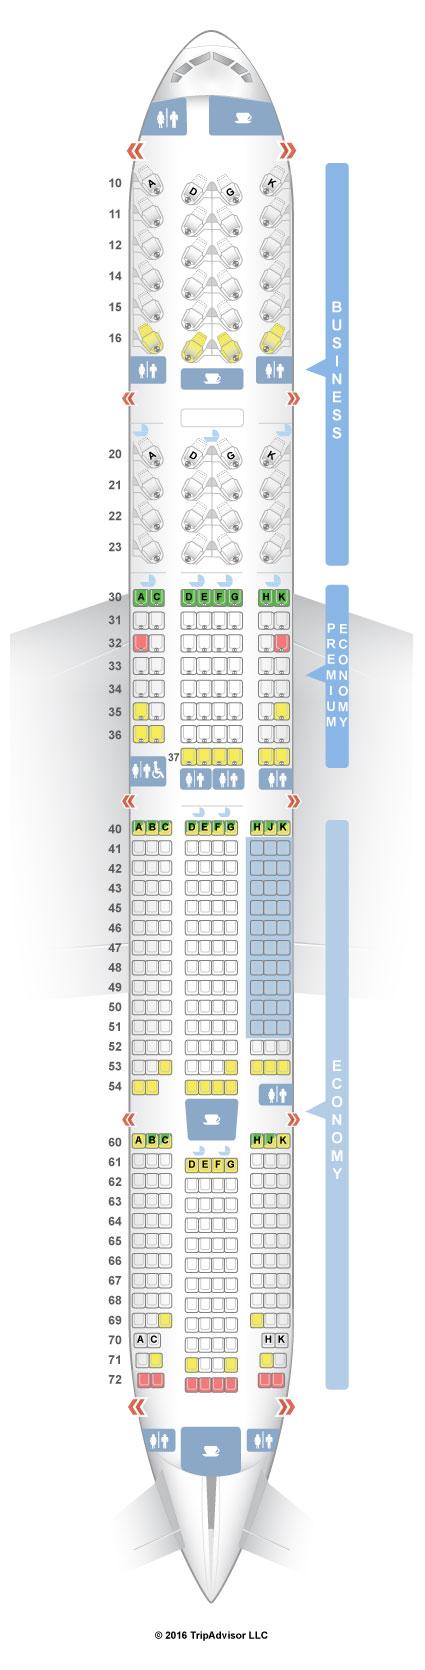 SeatGuru Seat Map China Airlines - SeatGuru